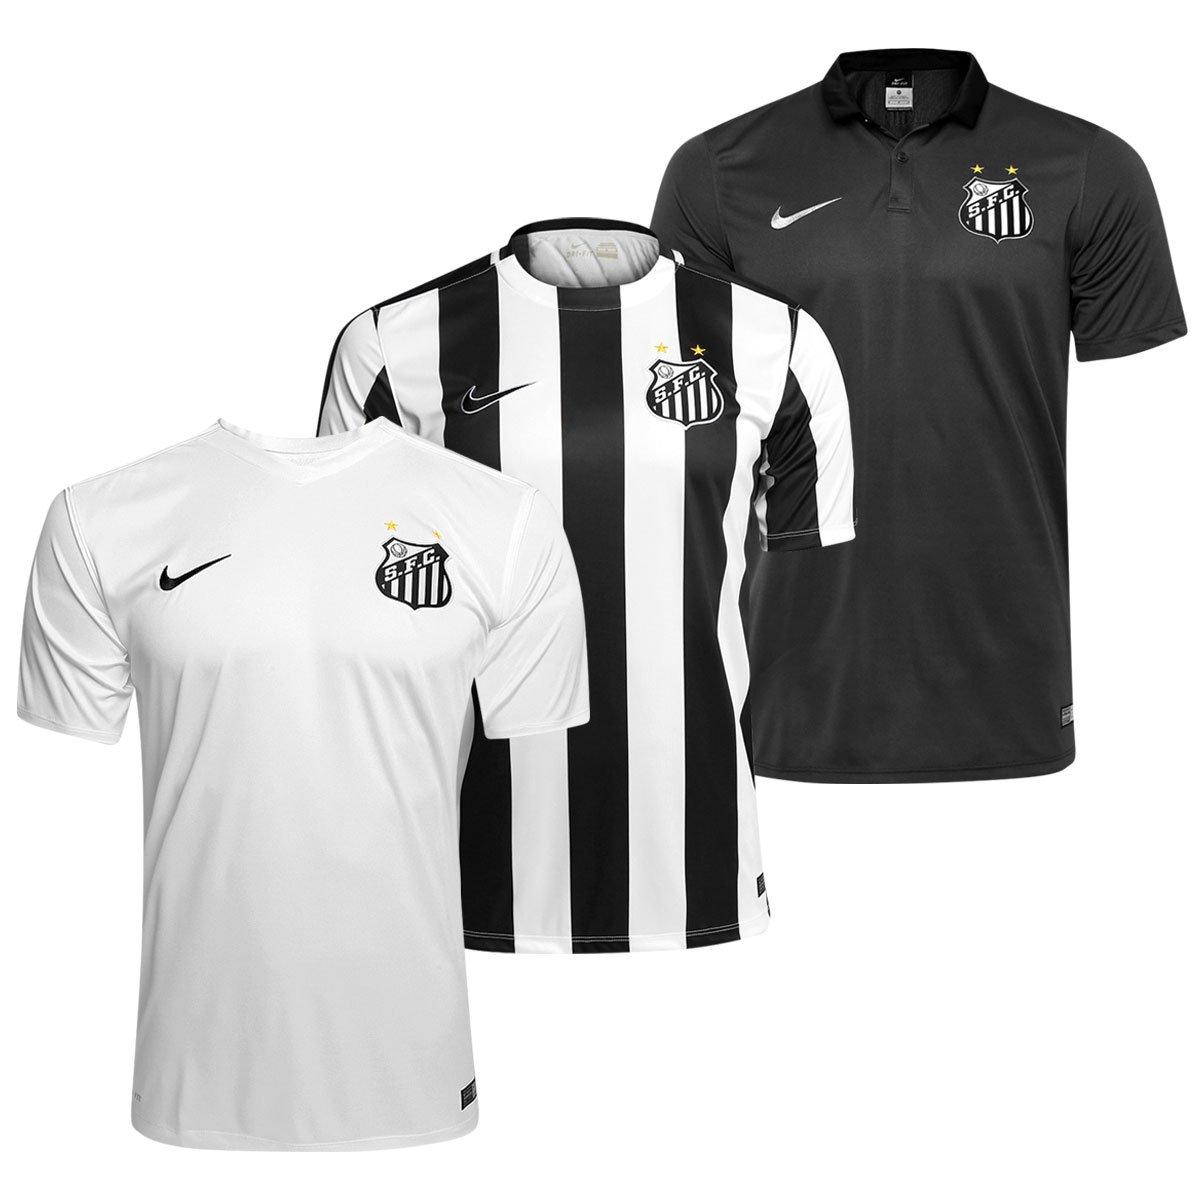 da349b50b4 Kit Nike Santos 2015 – Camisa I + Camisa II + Camisa III - Compre Agora